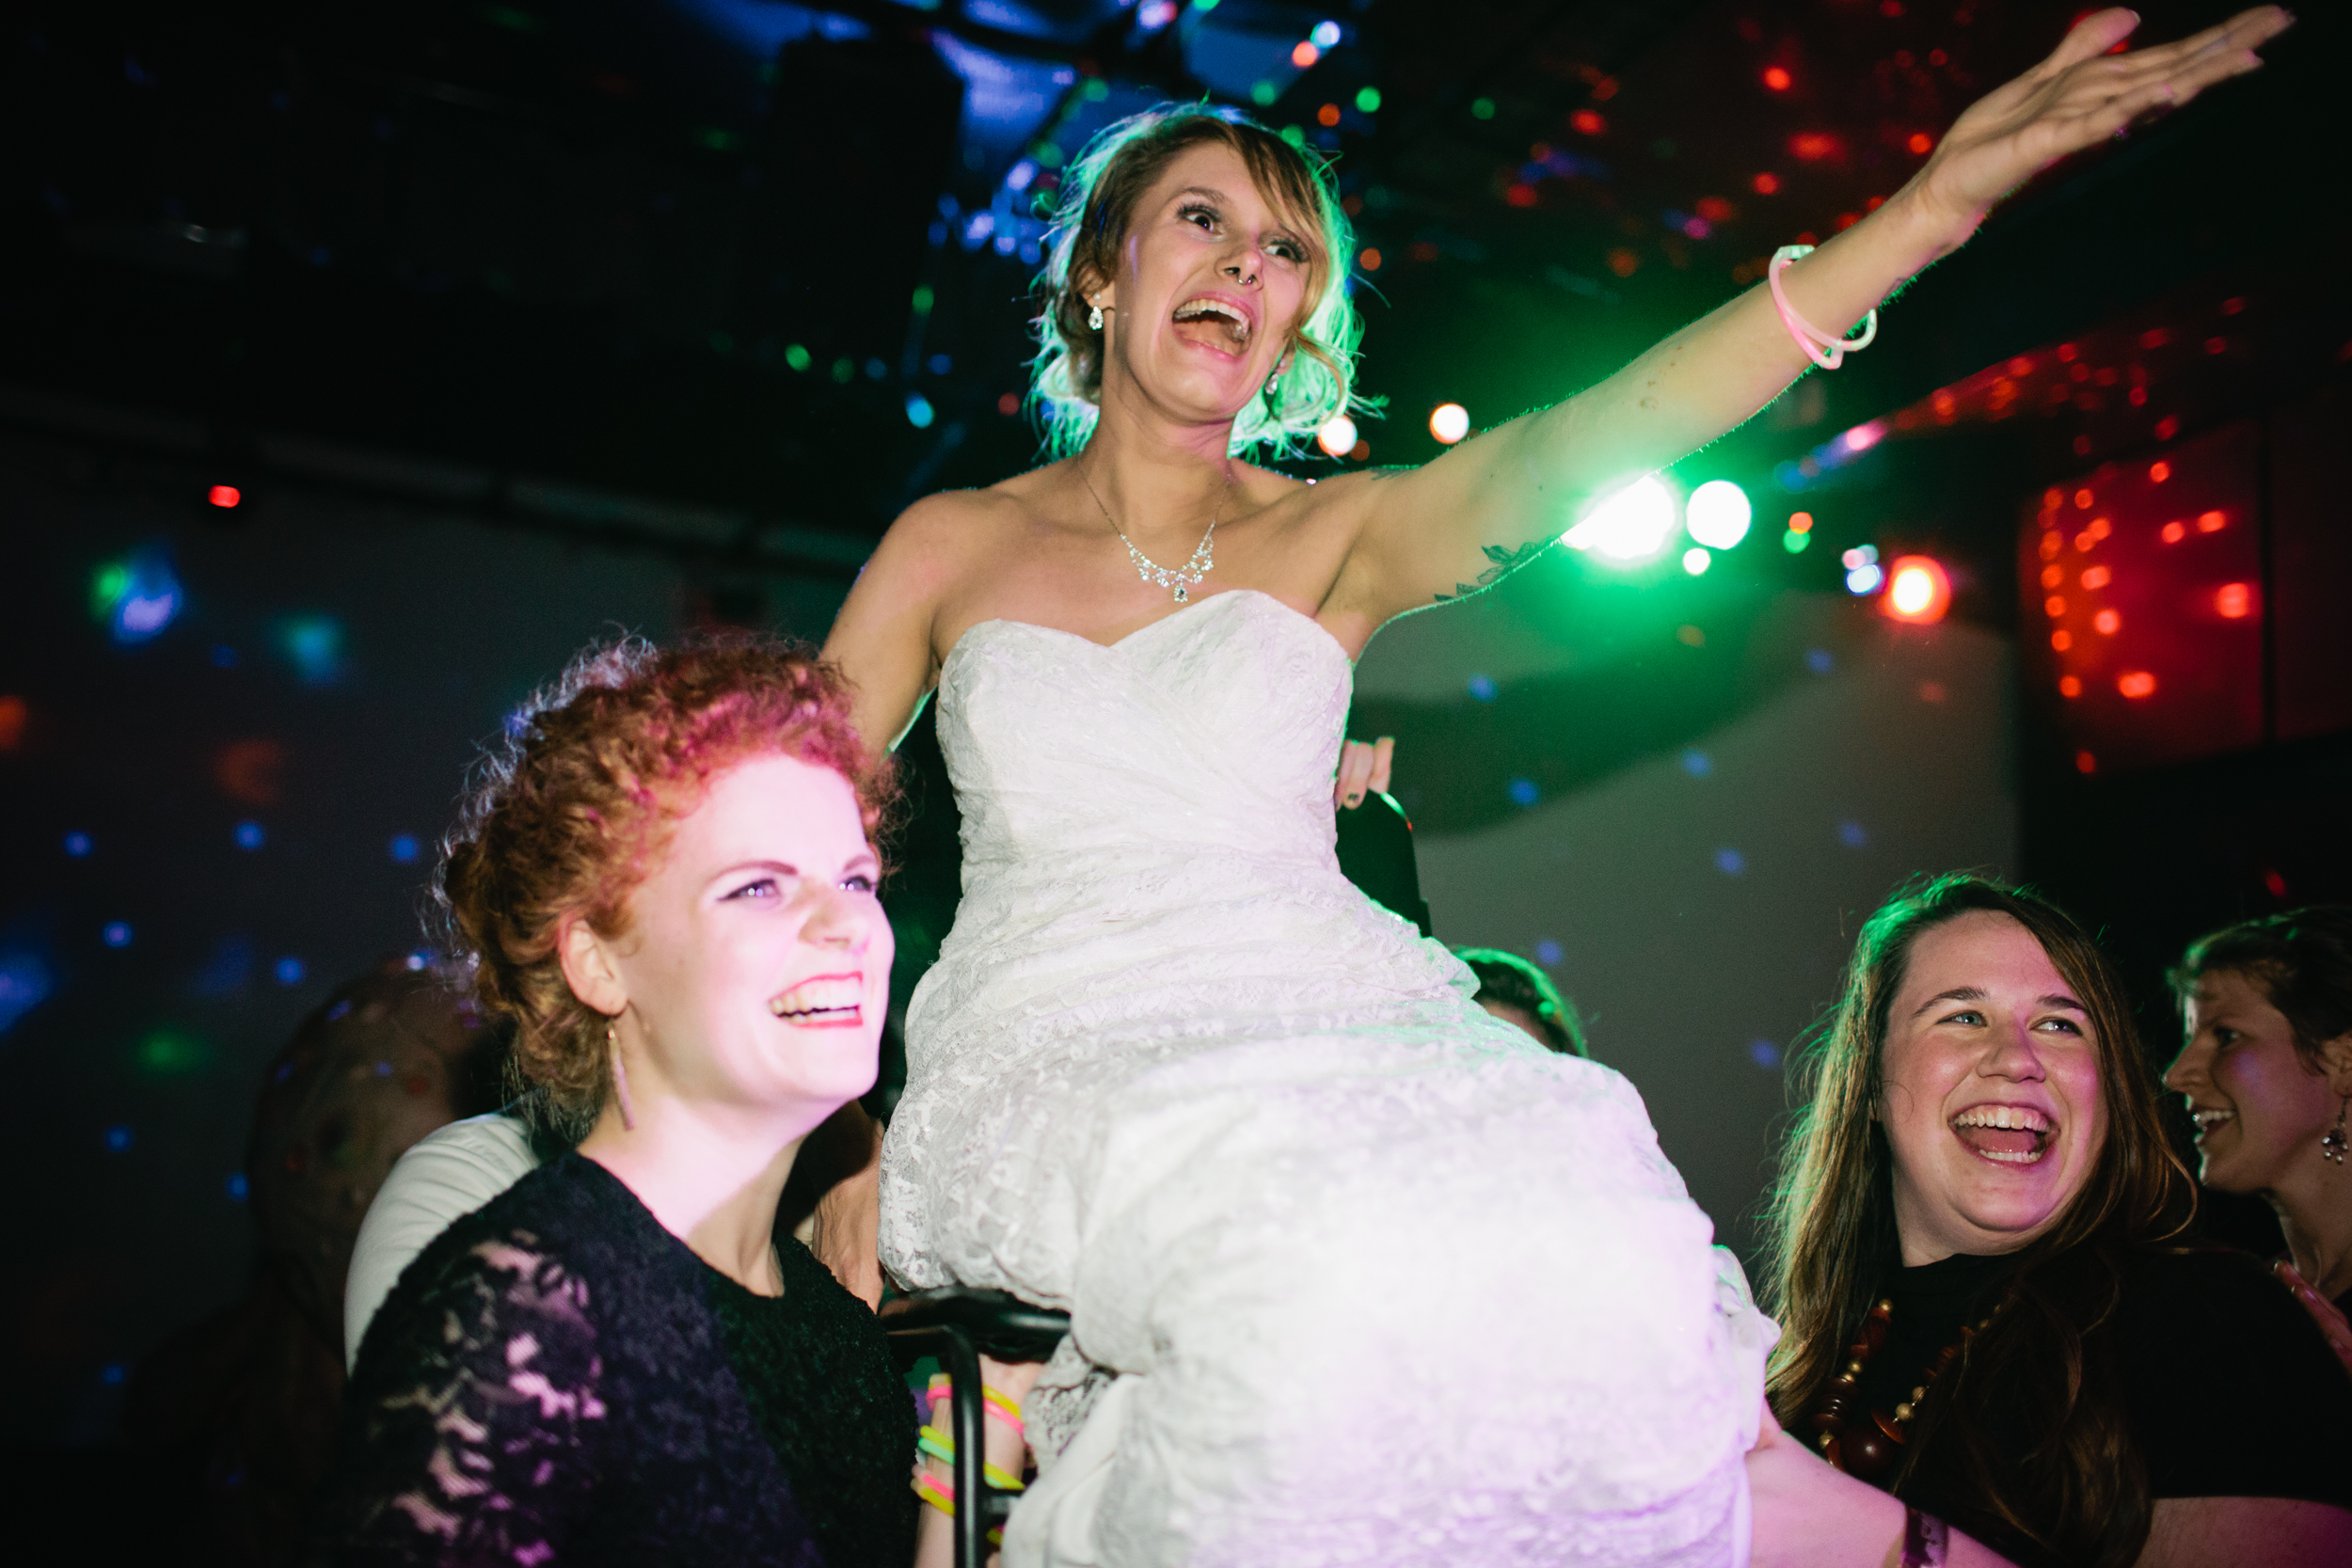 providence-wedding-photographer-168.jpg